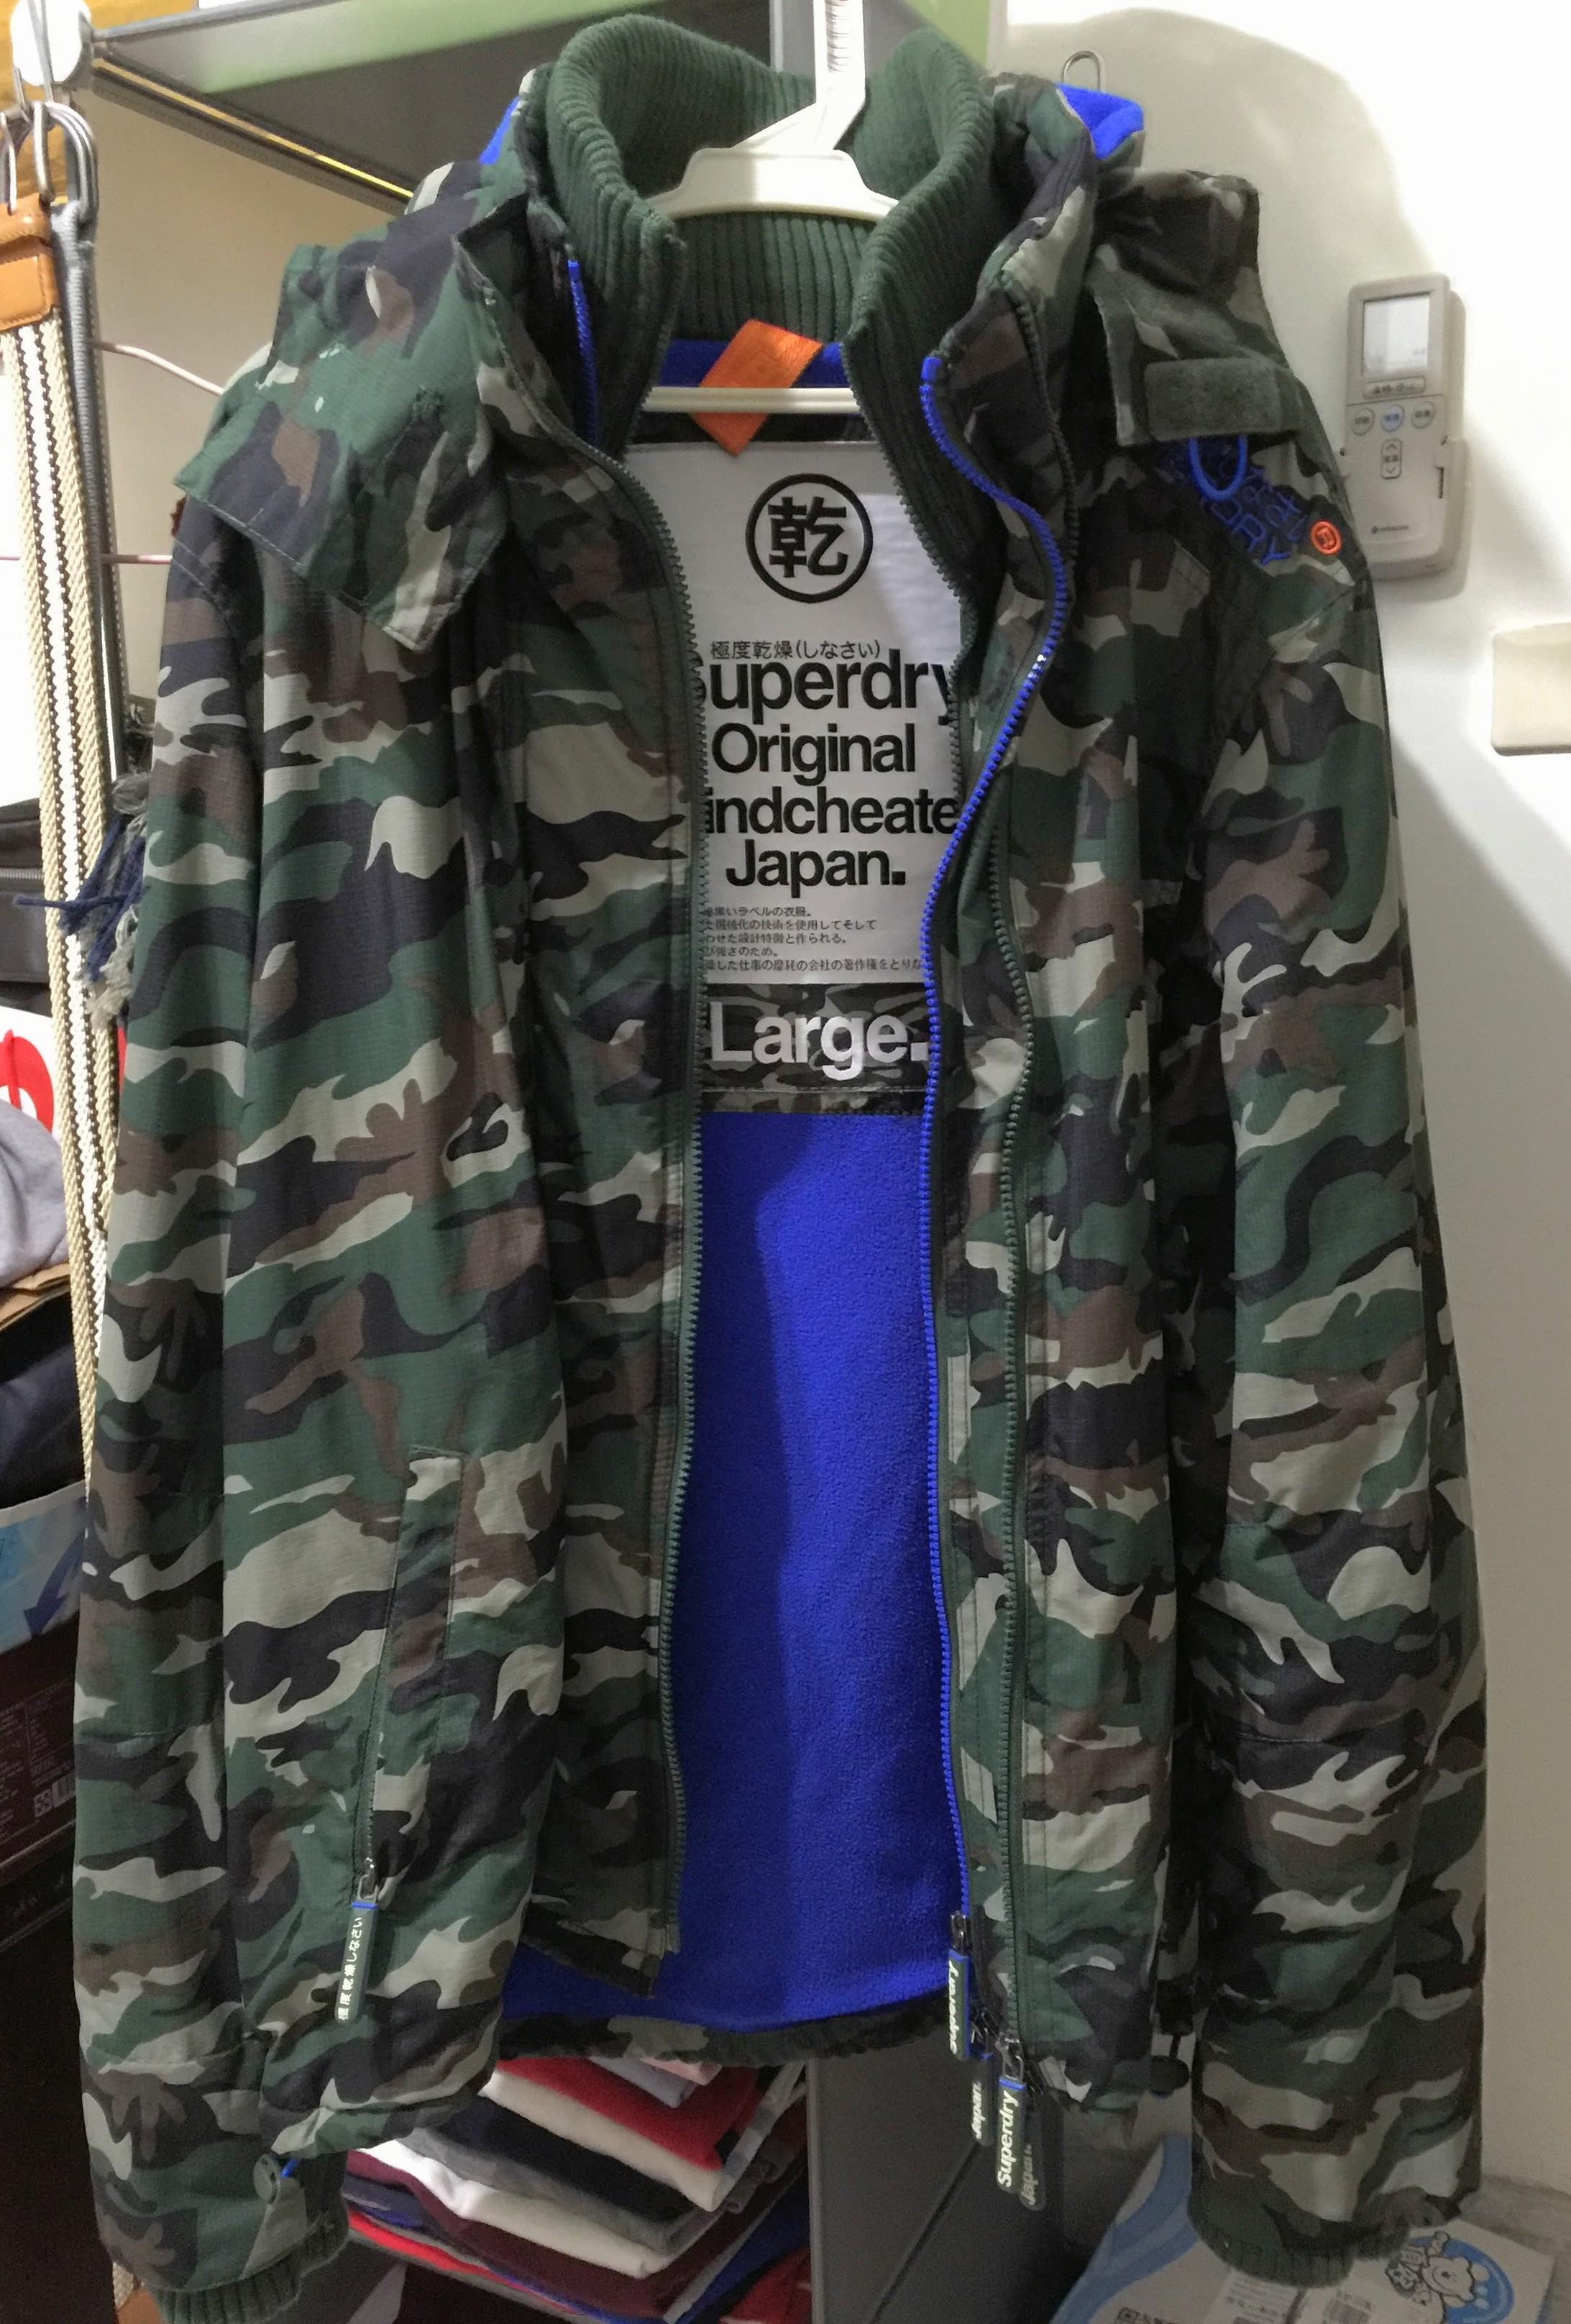 Superdry極度乾燥 迷彩風衣外套 (已預訂)